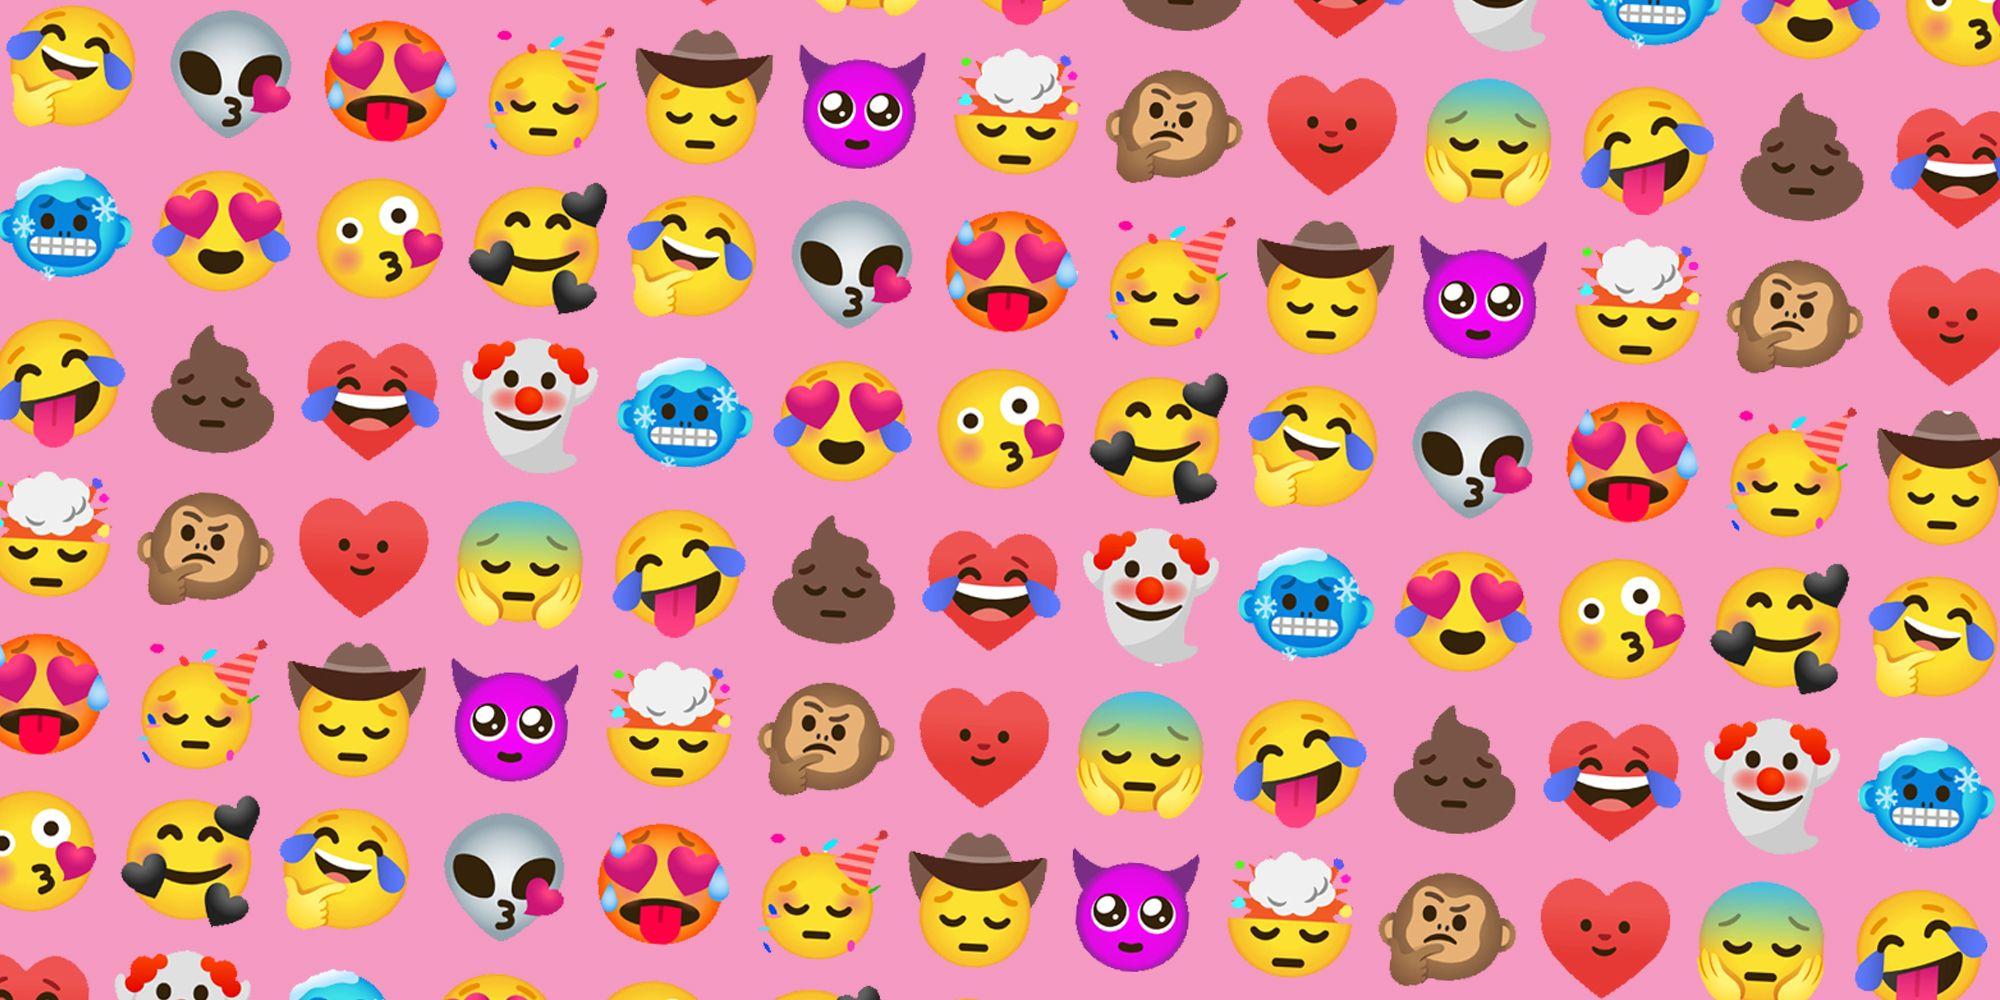 Hands On With Google S New Emoji Mashups